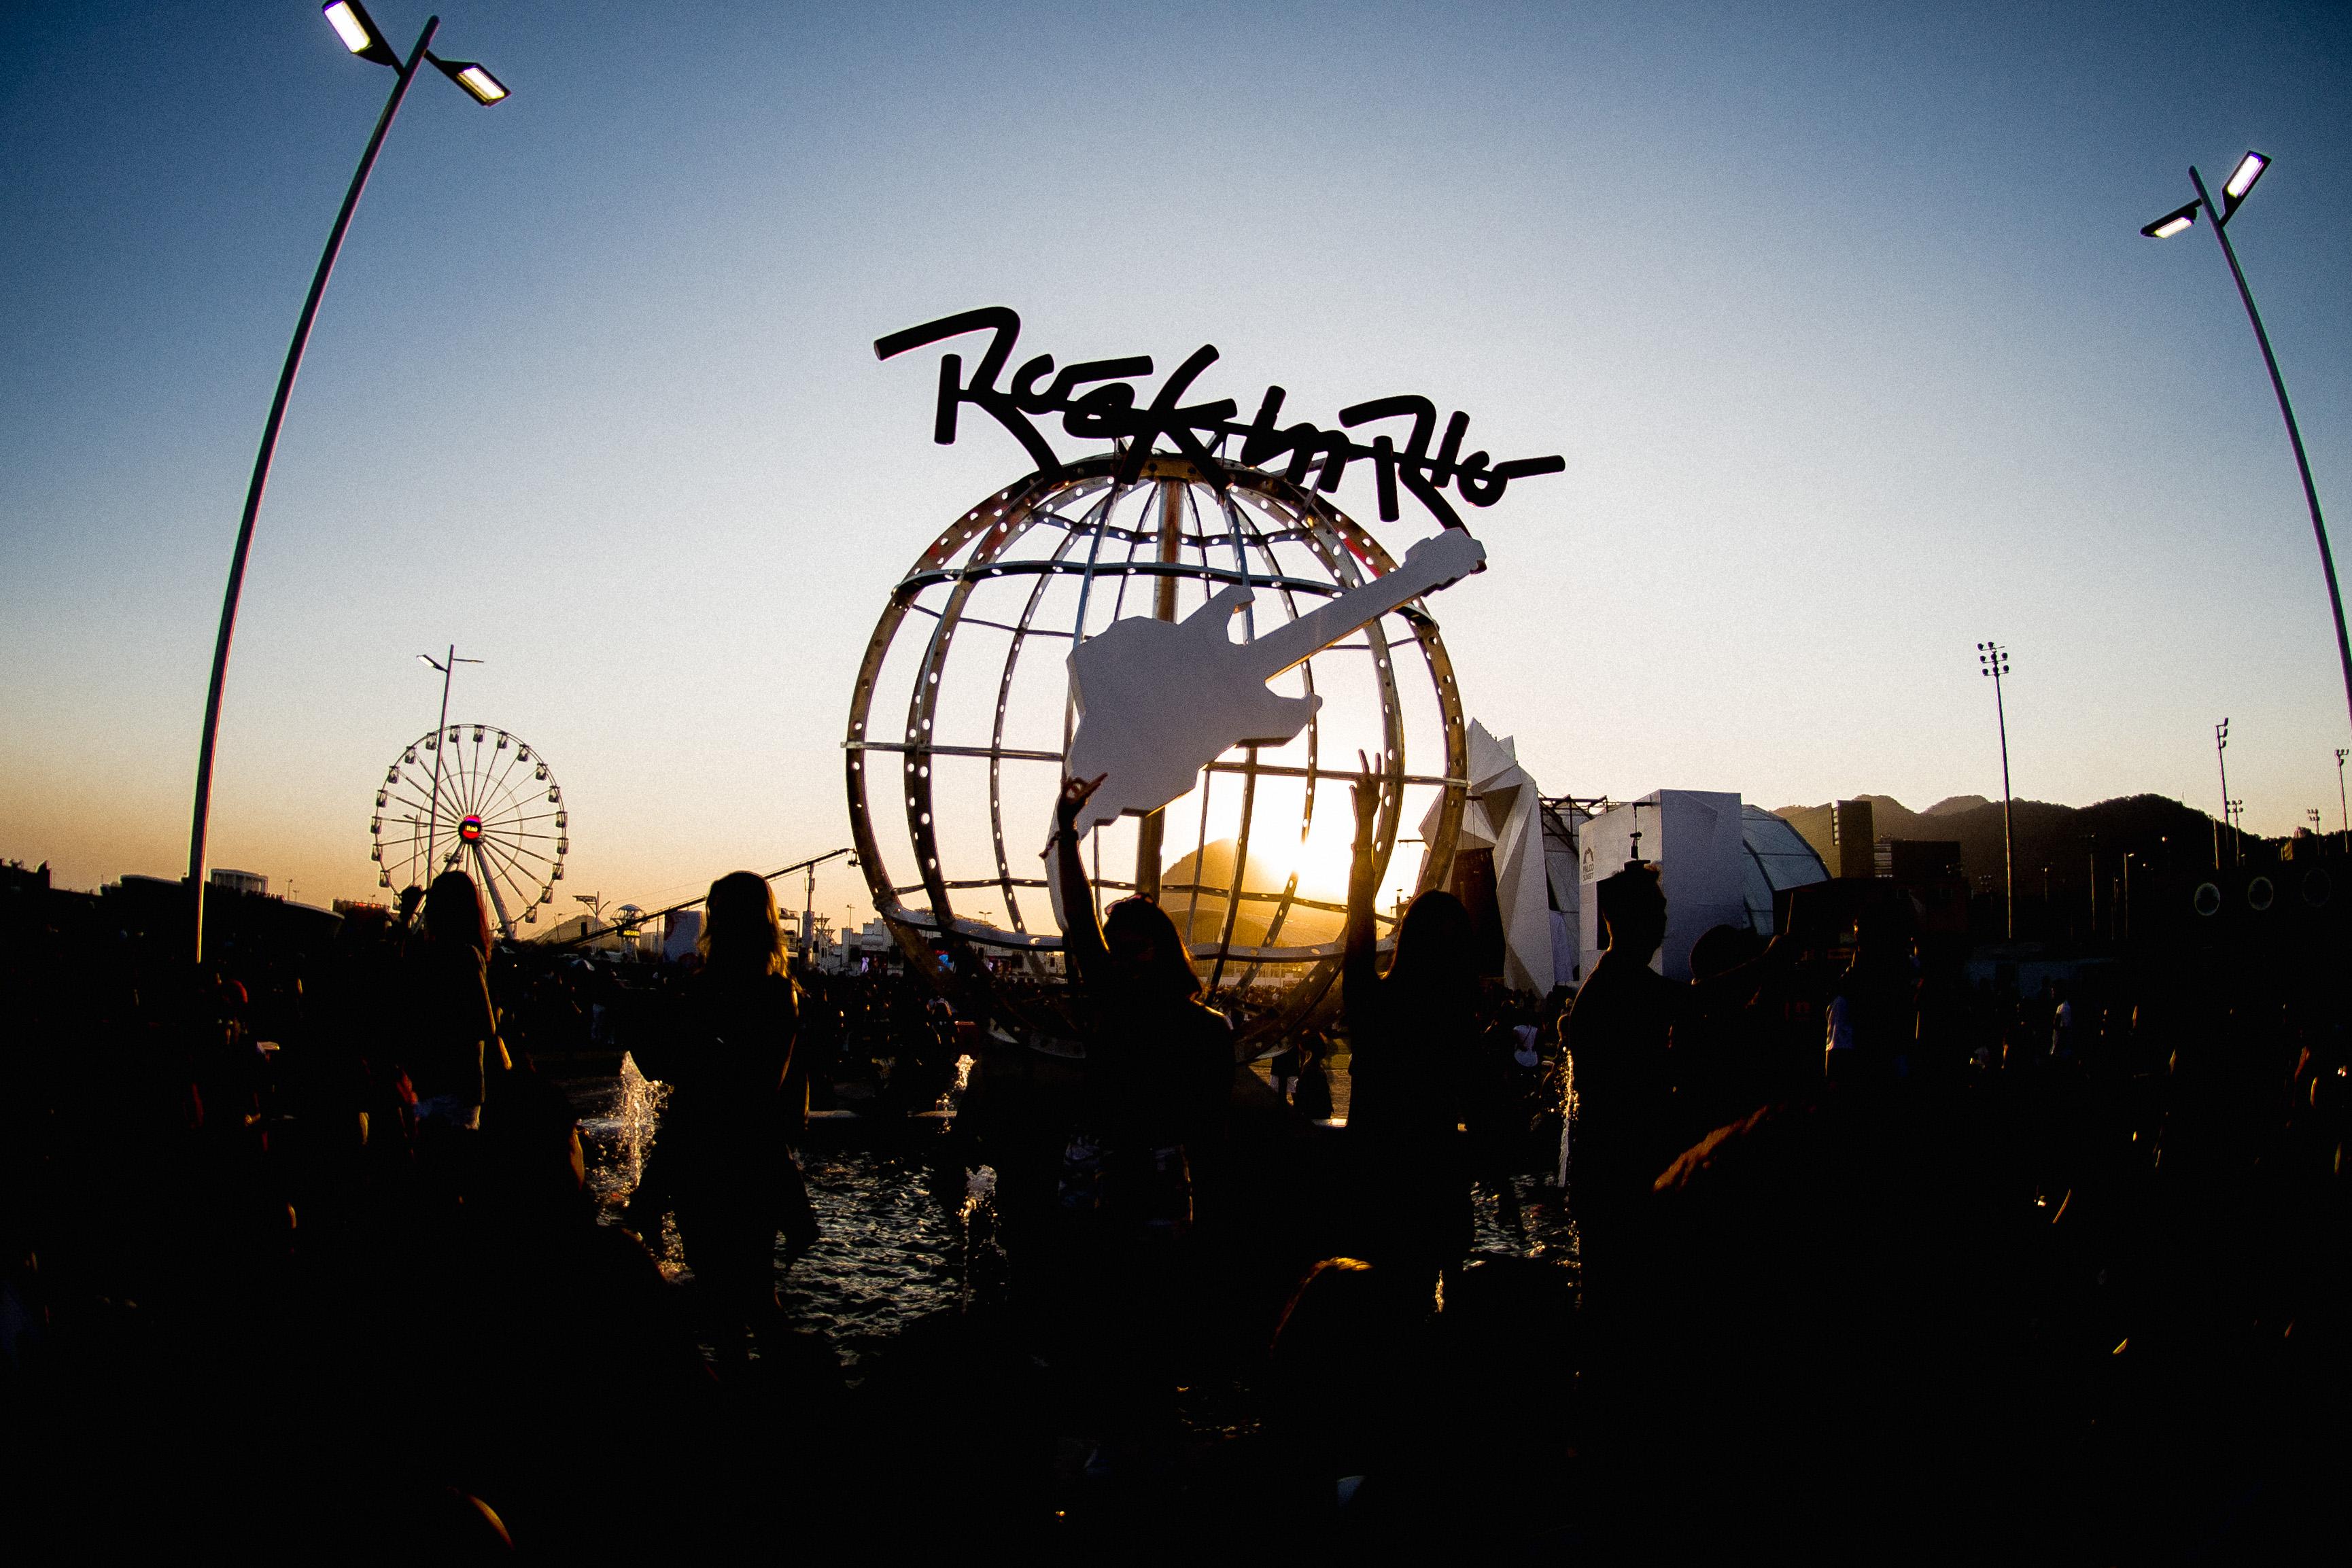 Rock in Rio: o maior espetáculo de música do mundo foi adiado para 2021